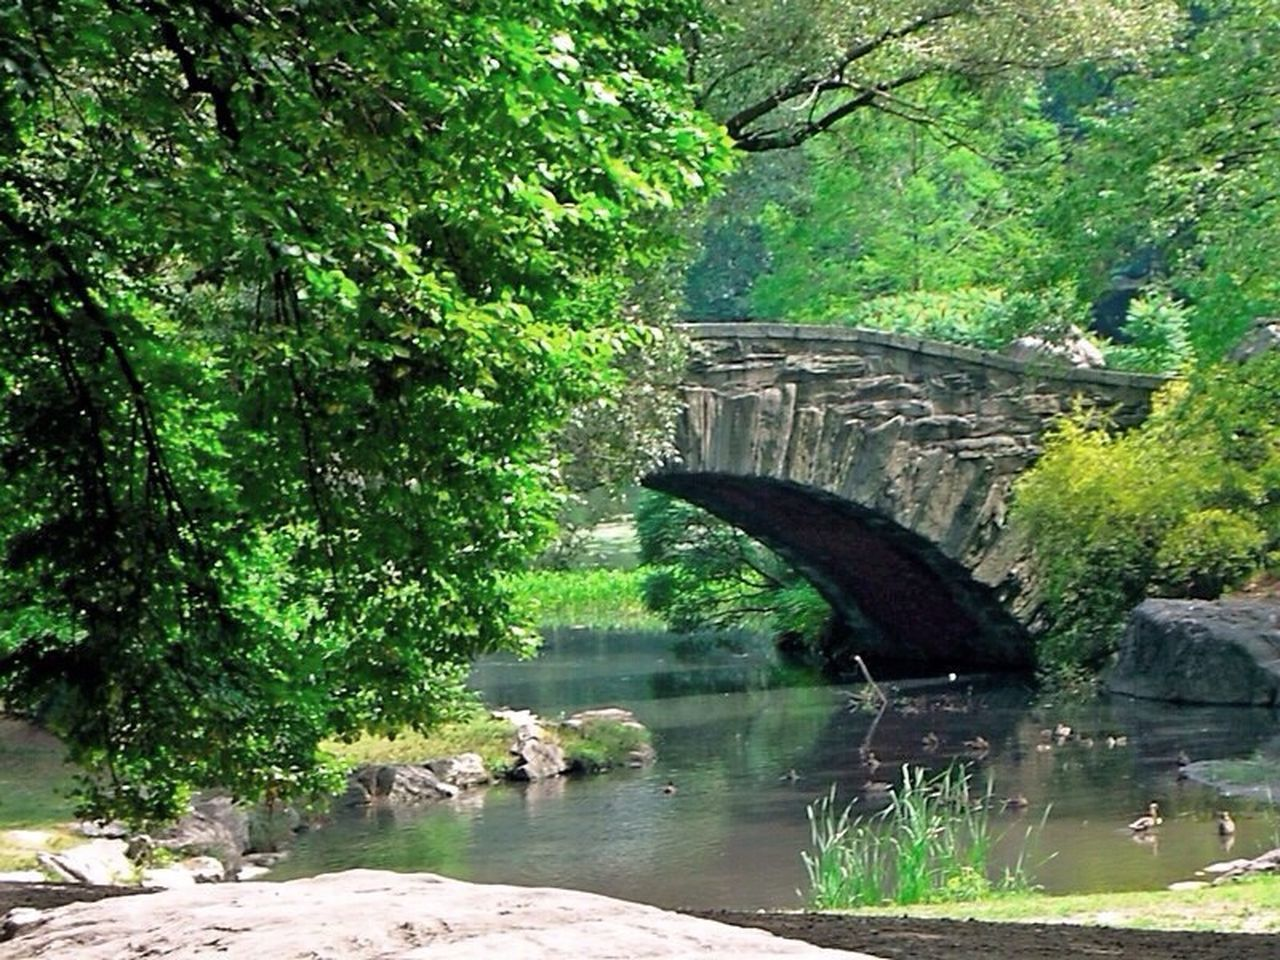 New York ..NYC .. CentralPark Bridge From Where I Stand